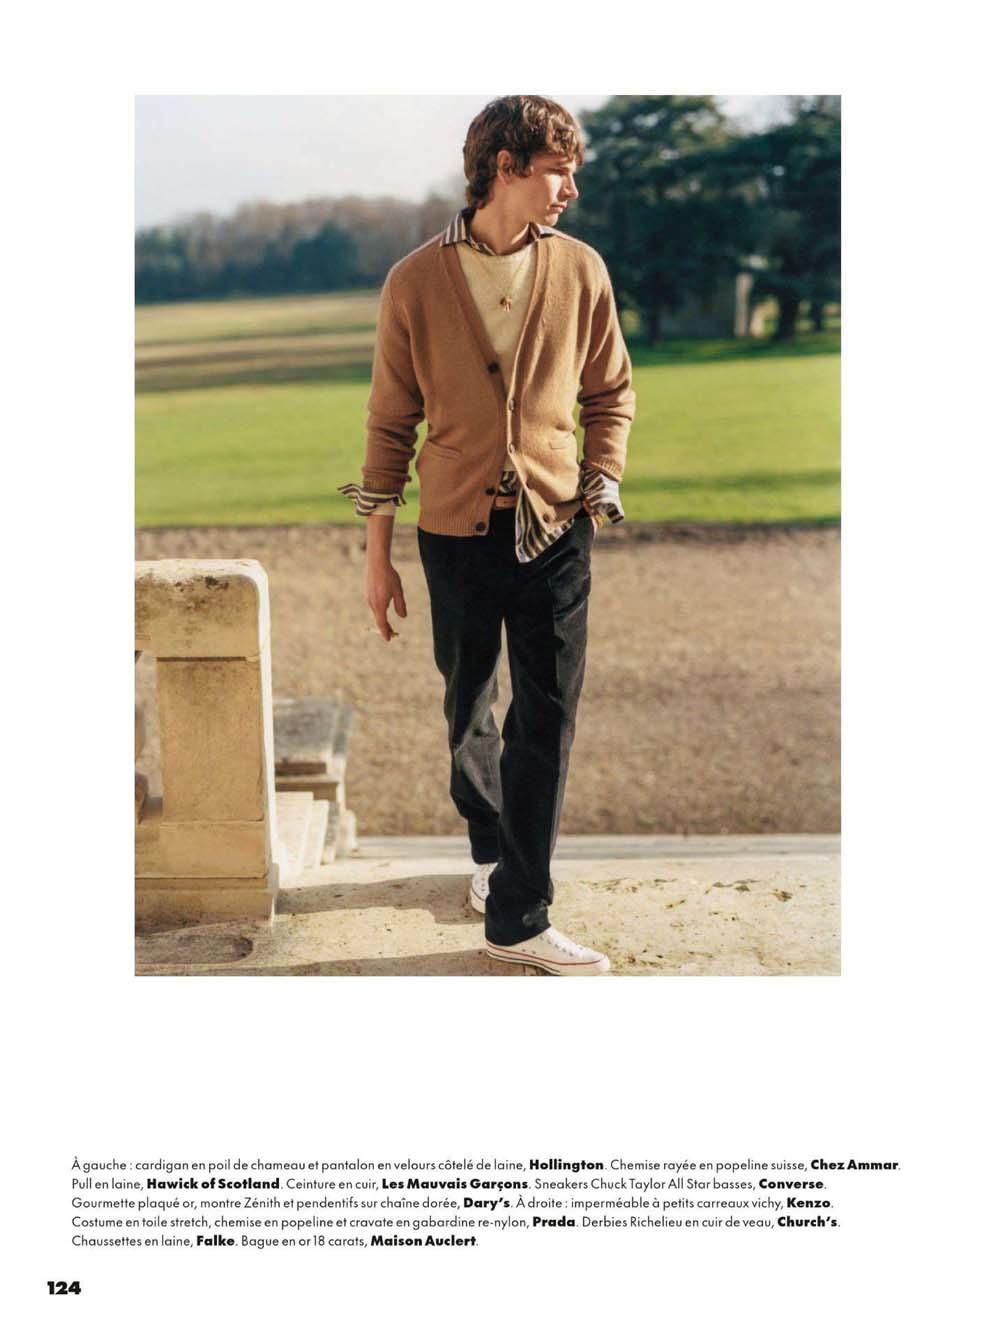 Erik van Gils by Scott Trindle for GQ France February 2021 Editorial